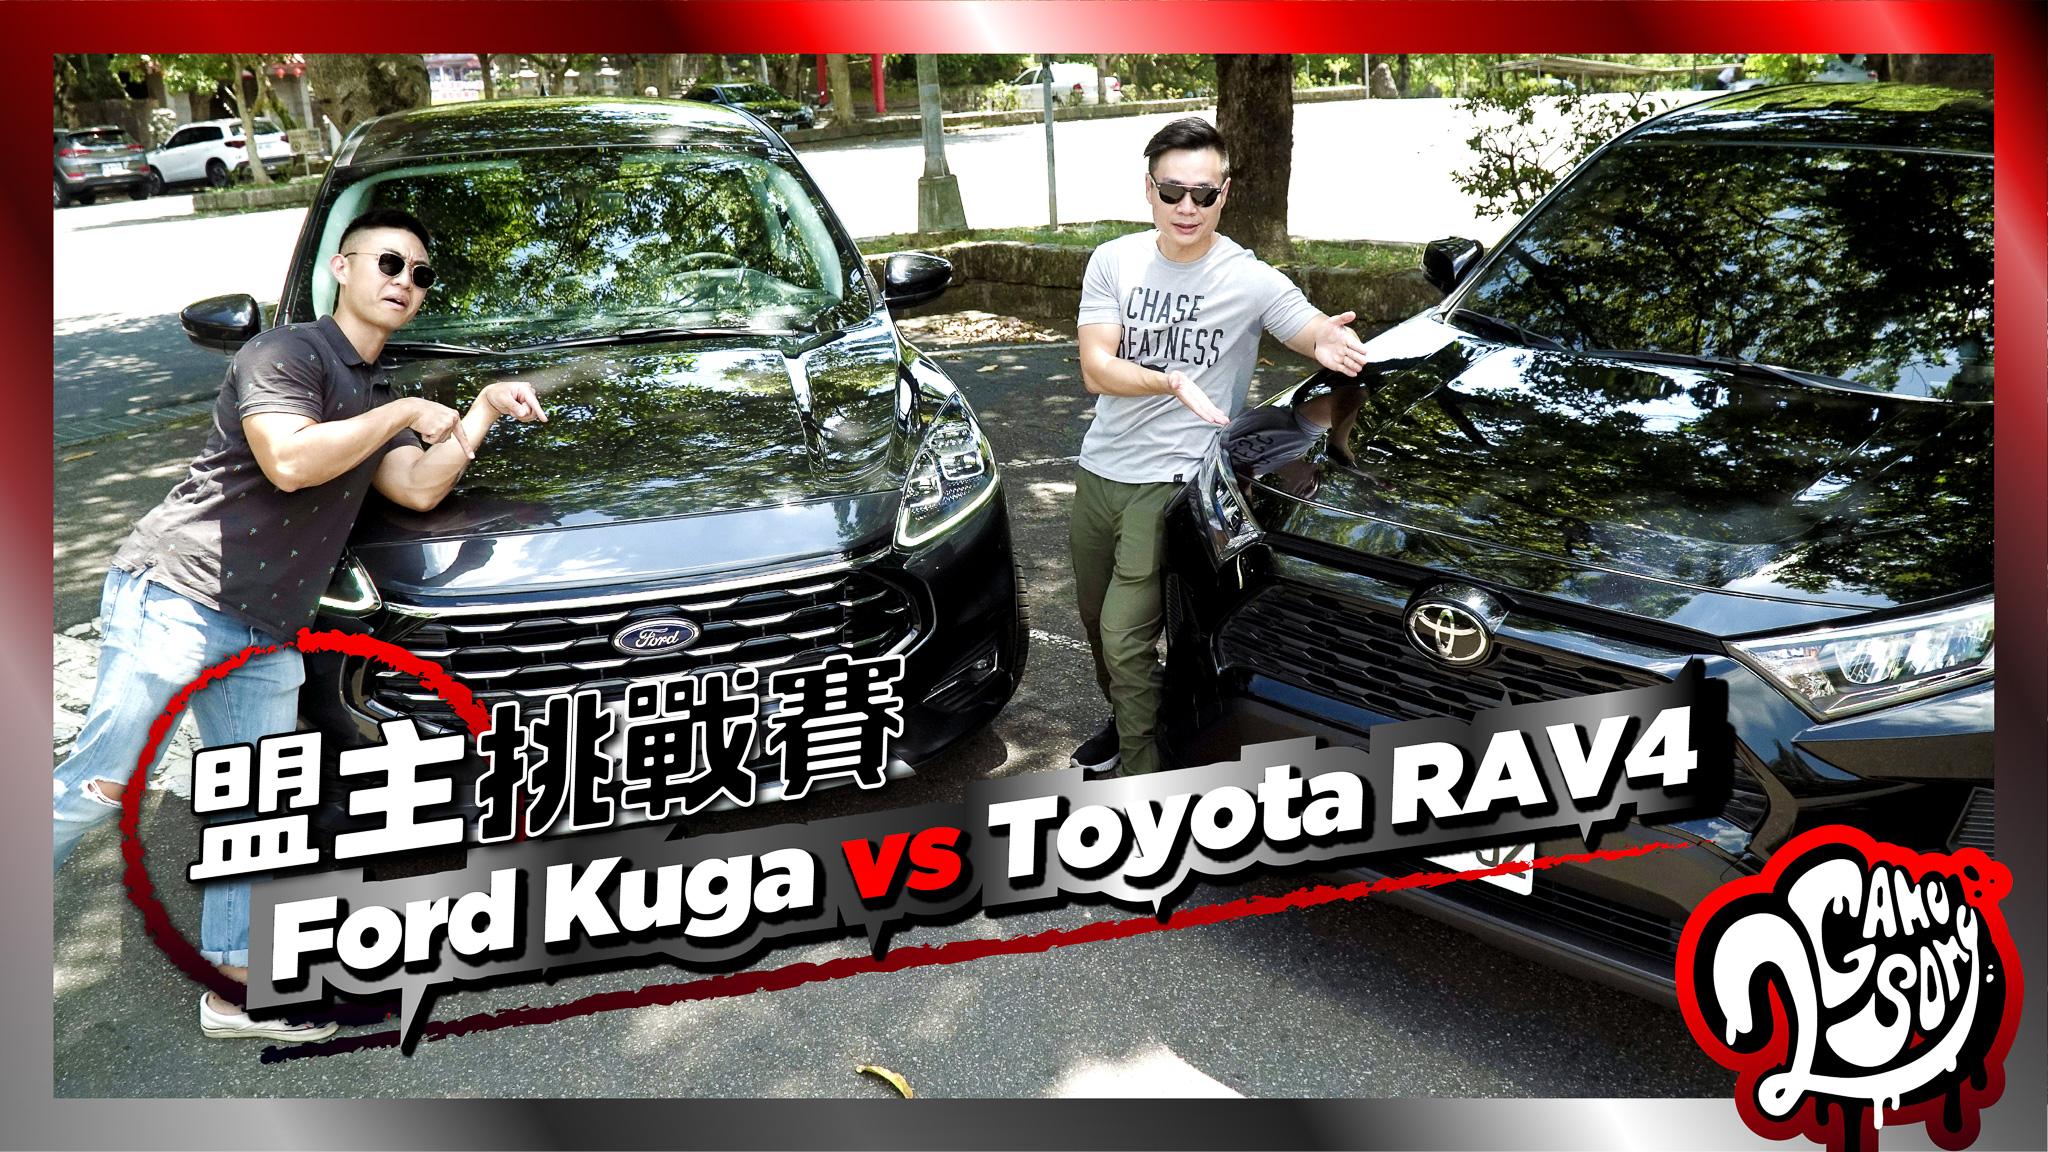 【盟主挑戰賽】Ford Kuga vs Toyota RAV4 集評誰有勝算?